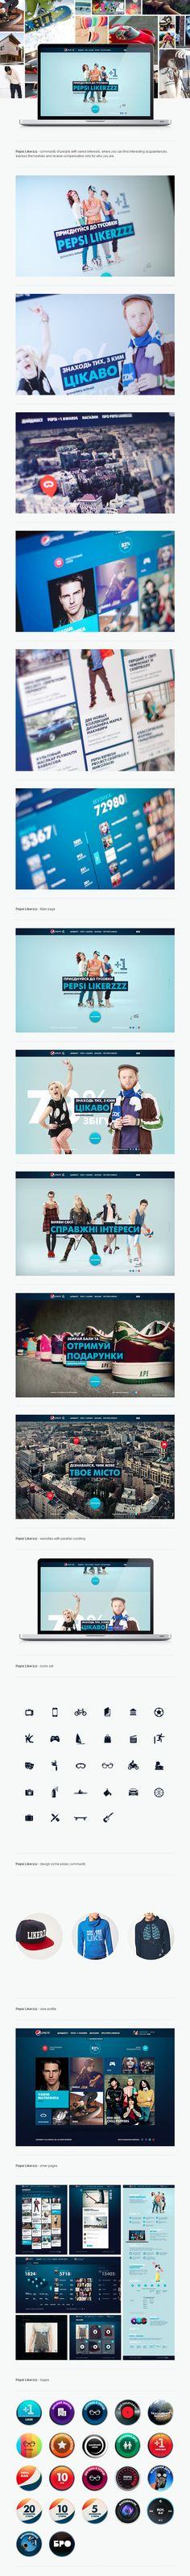 Pepsi Likerzzz / Dmitry Silantiev #webdesign #ui #design #user #iterface #web